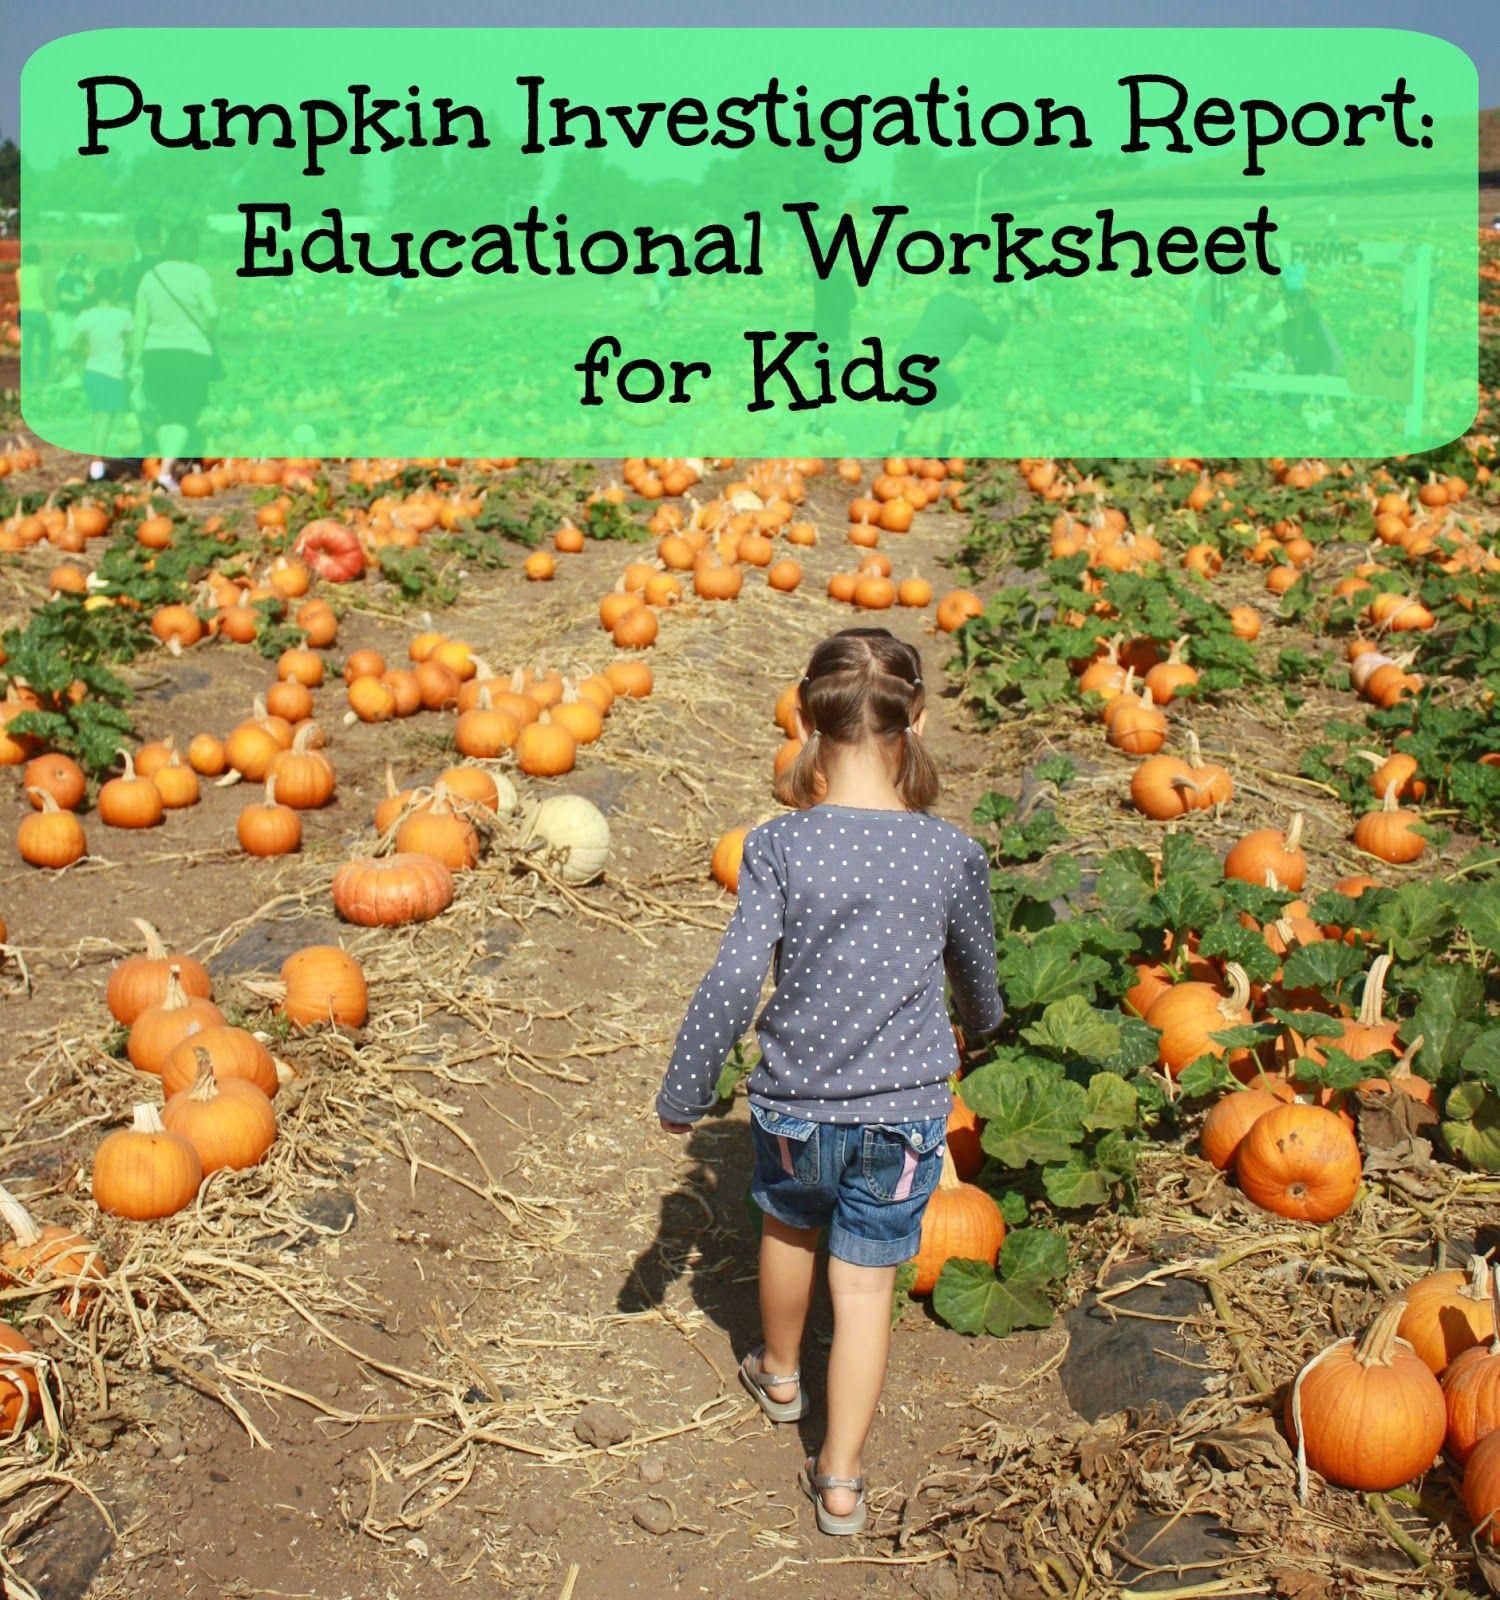 Pumpkin Patch Field Trip Includes Free Educational